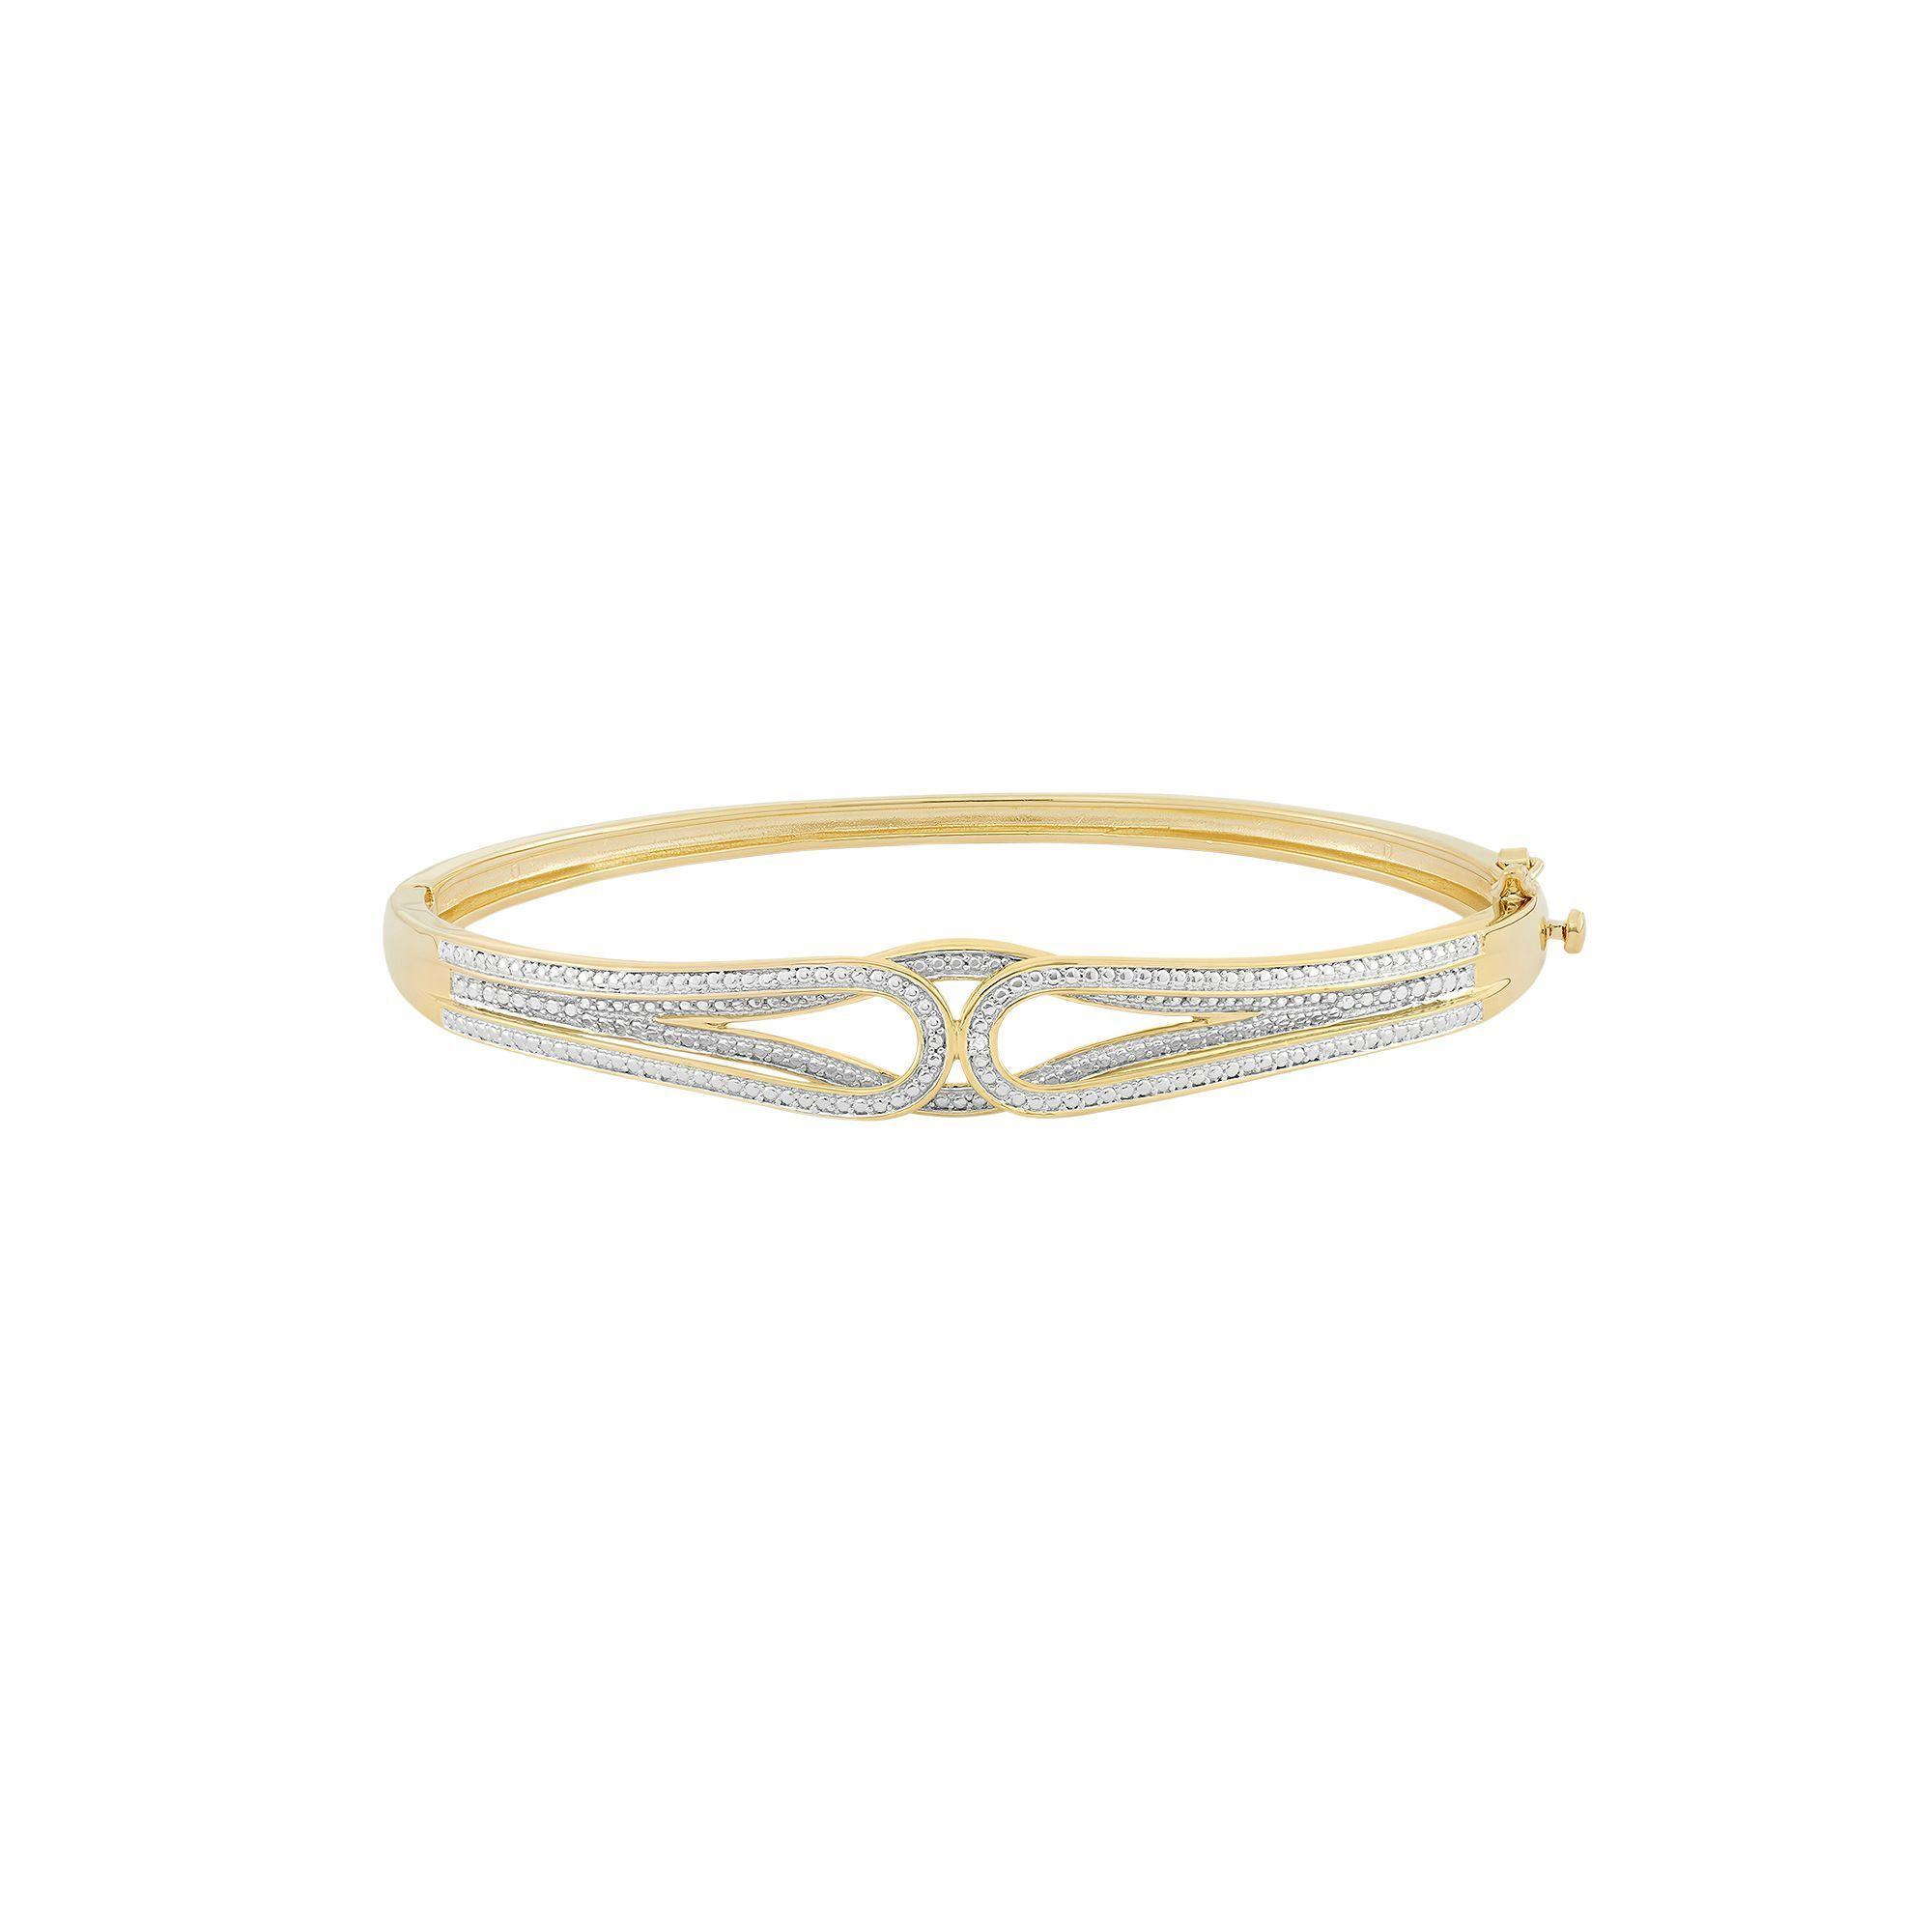 Kohlus k gold over silver hinged bangle bracelet bangle and products